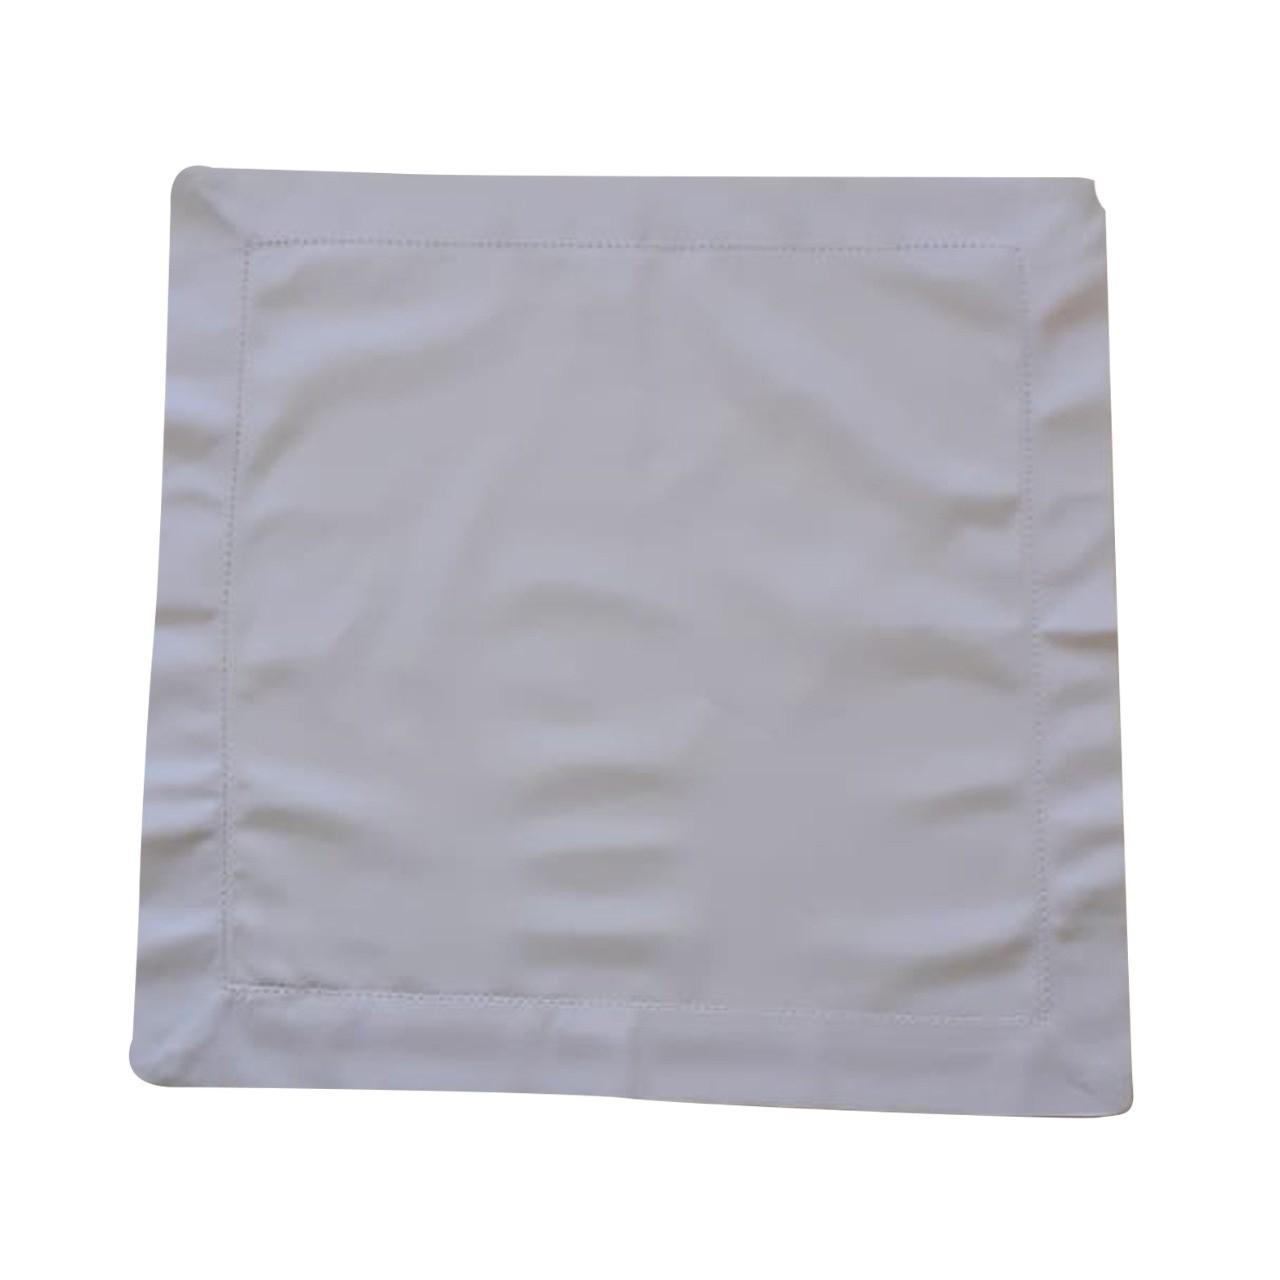 Guardanapo Ponto Aju 40x40cm Tecido Branco - Noemy Artesan